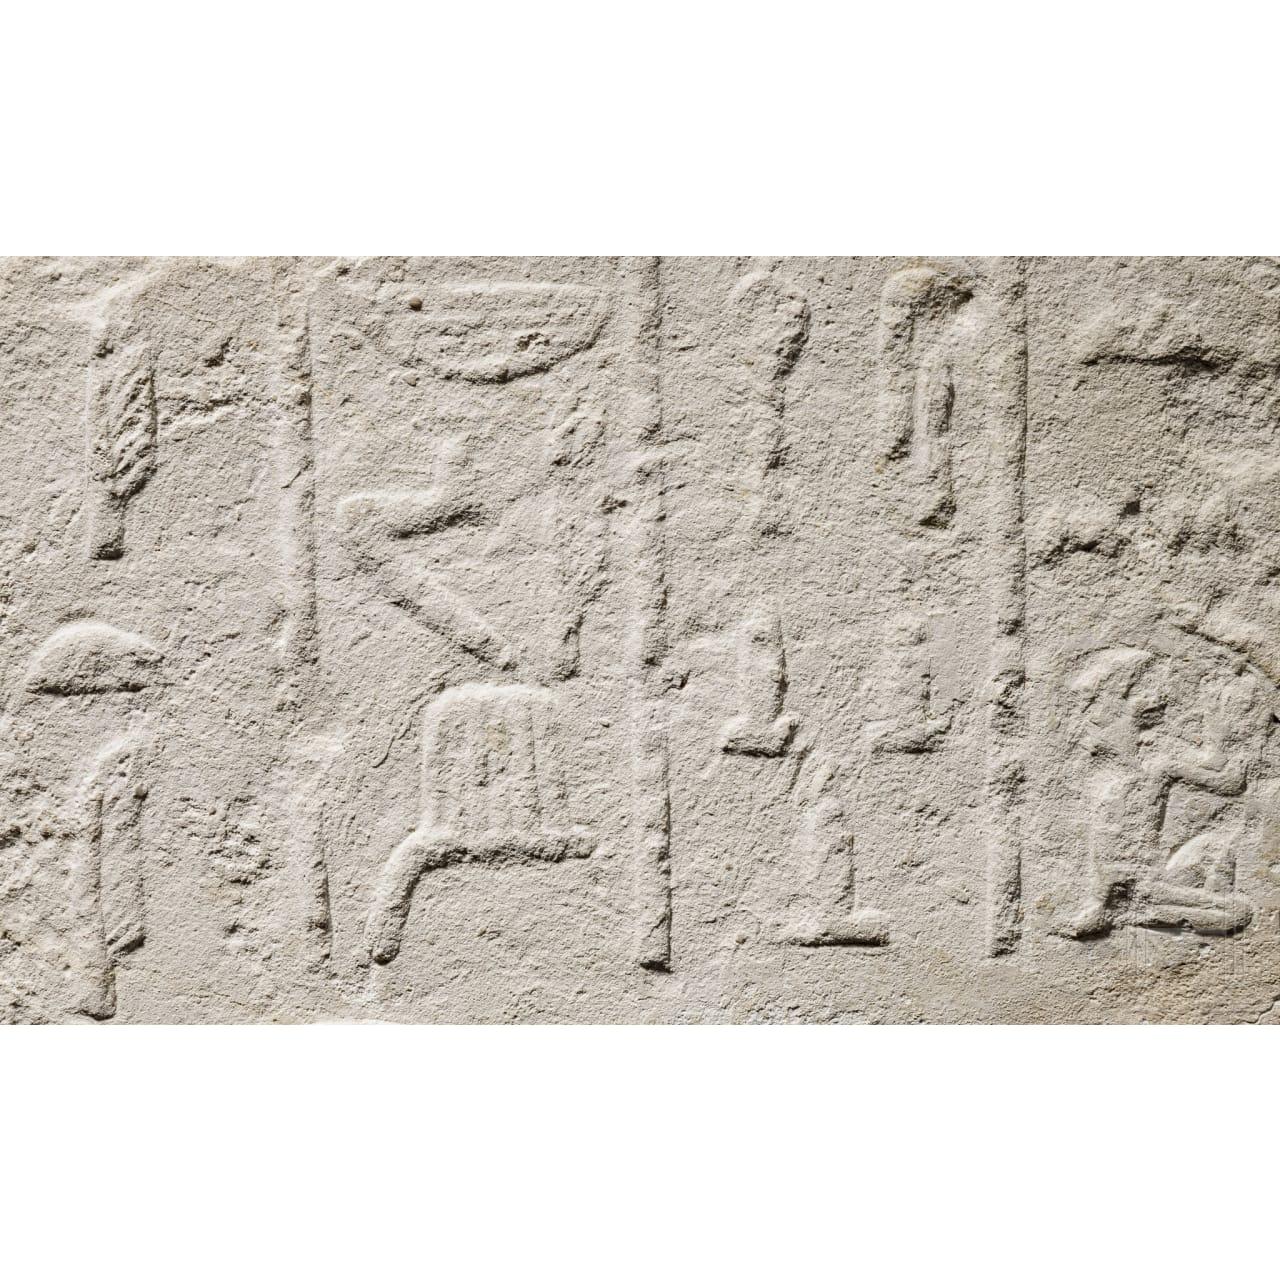 An impressive Egyptian limestone relief of Iti, Old Kingdom, 5th - 6th dynasty, 2498-2181 B.C.